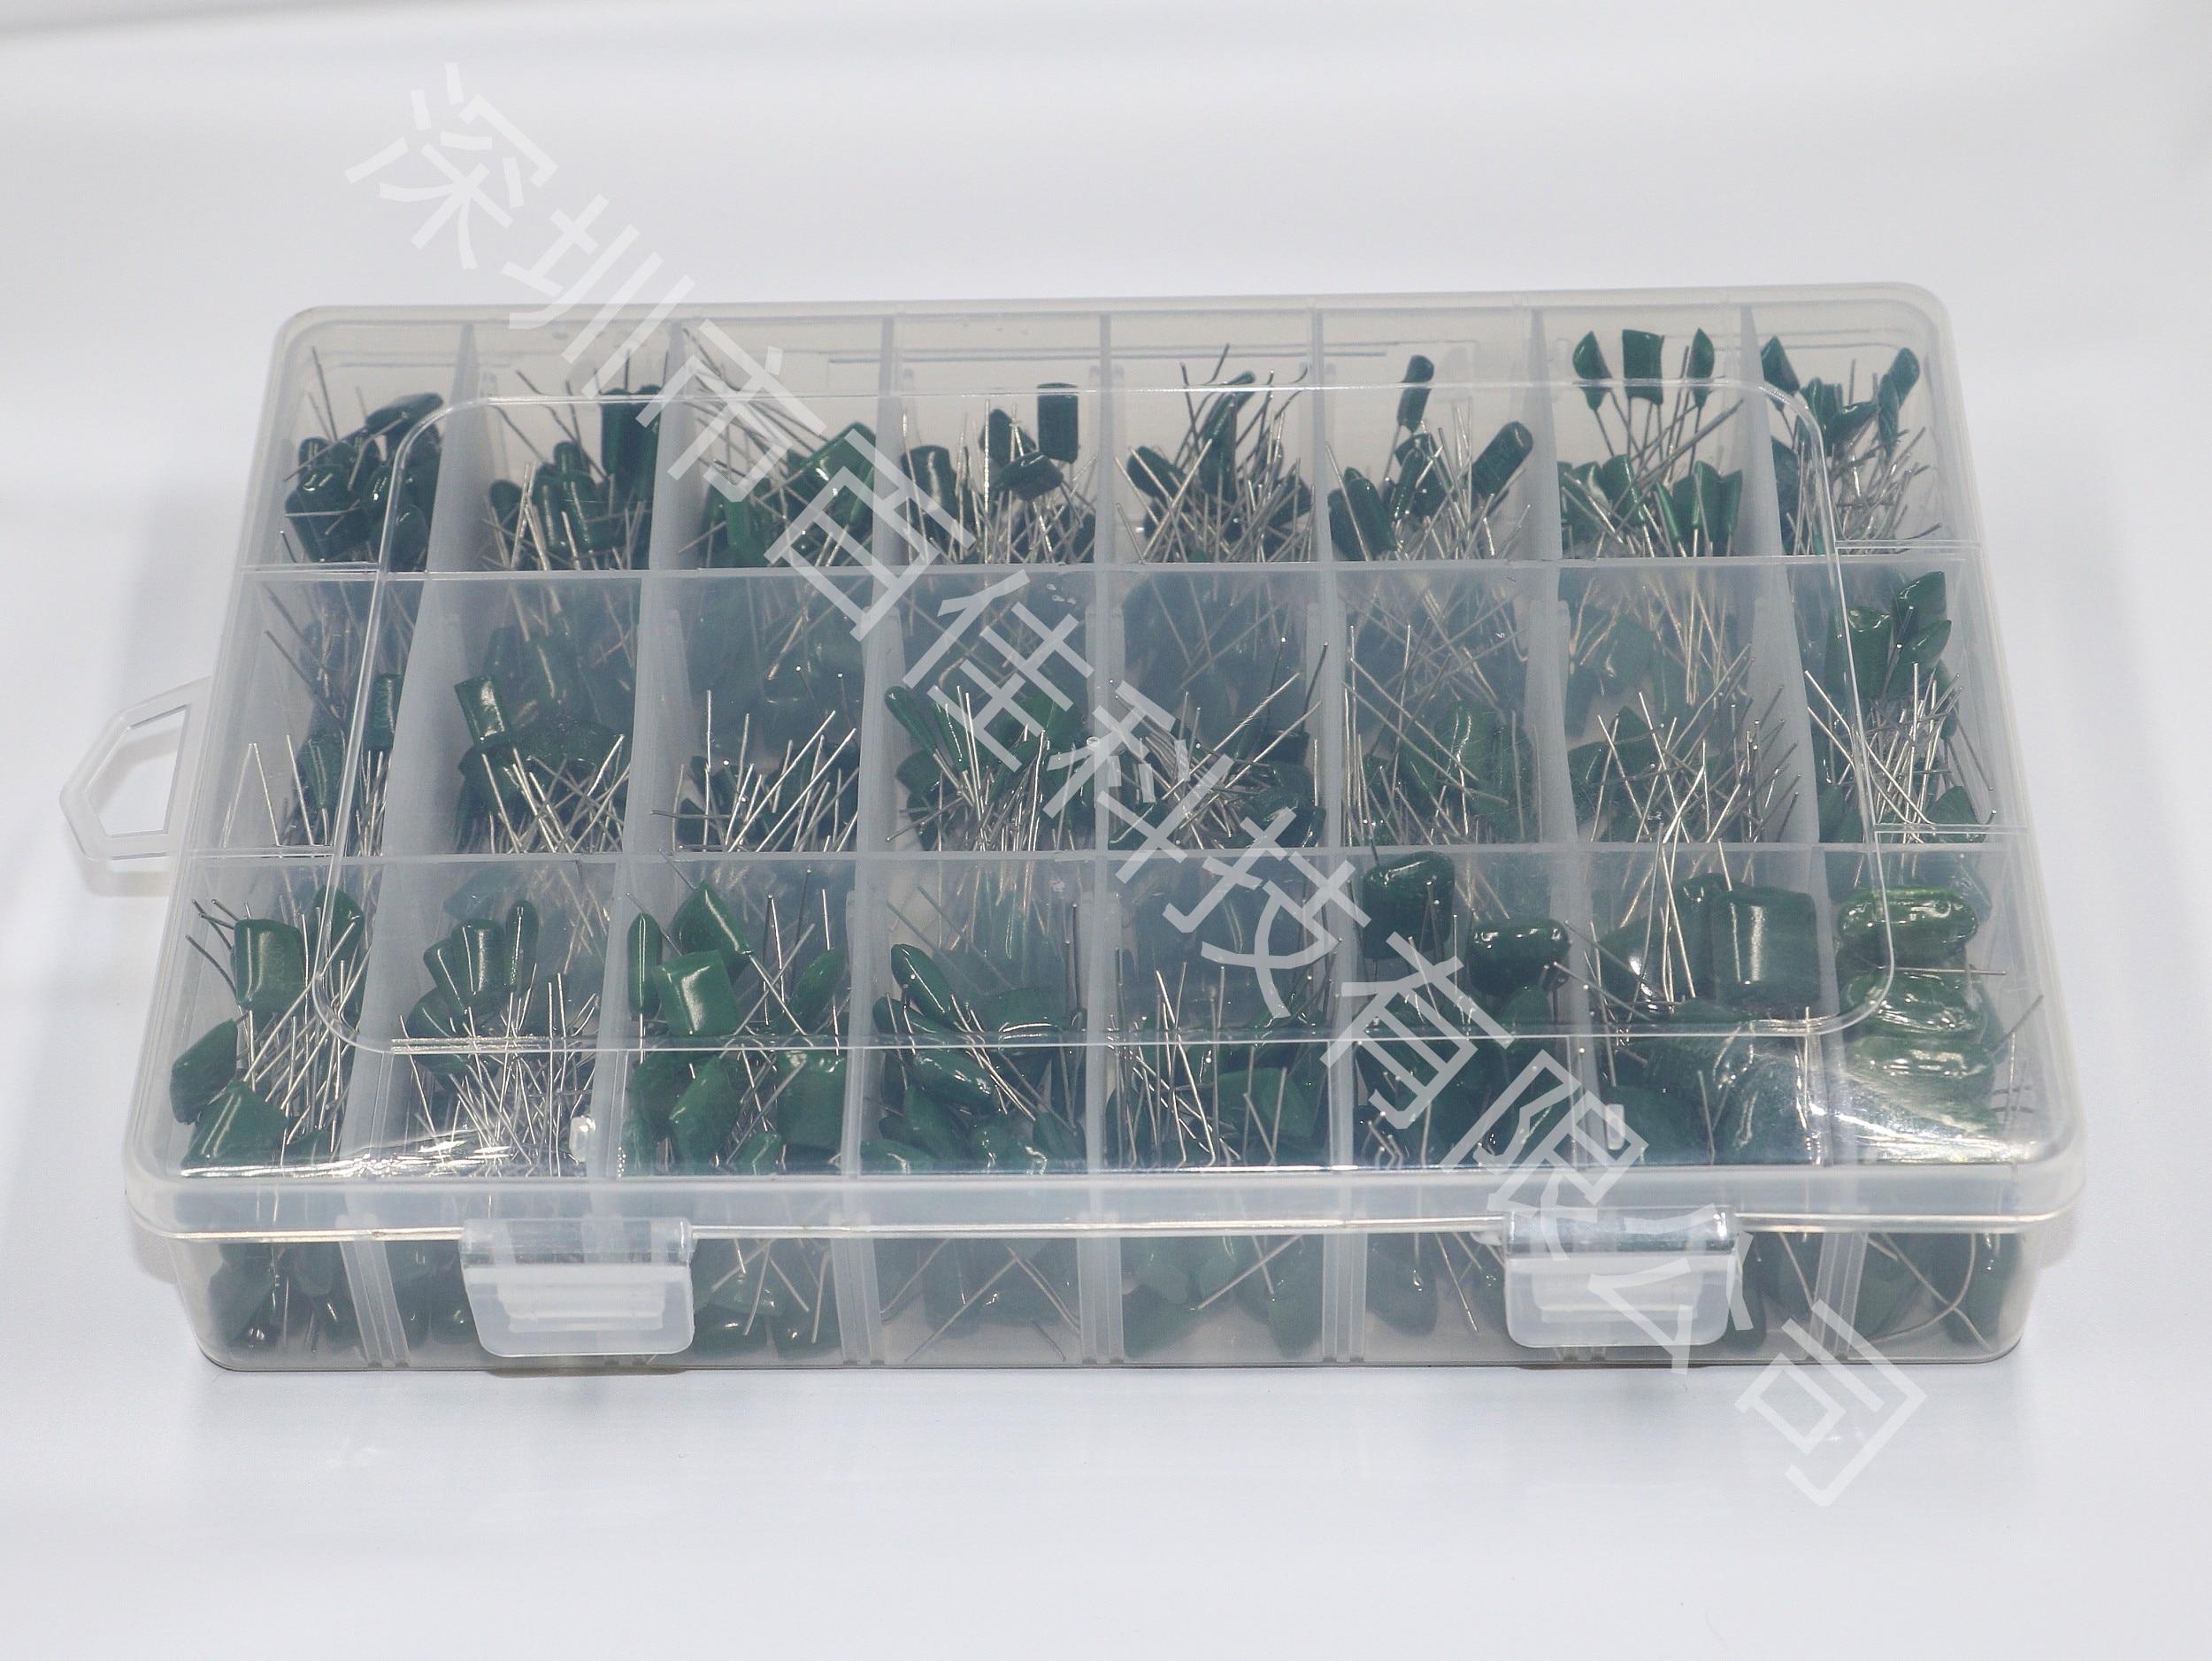 24 arten von 100v boxed polyester polyester film kondensator kit, insgesamt 660 stücke